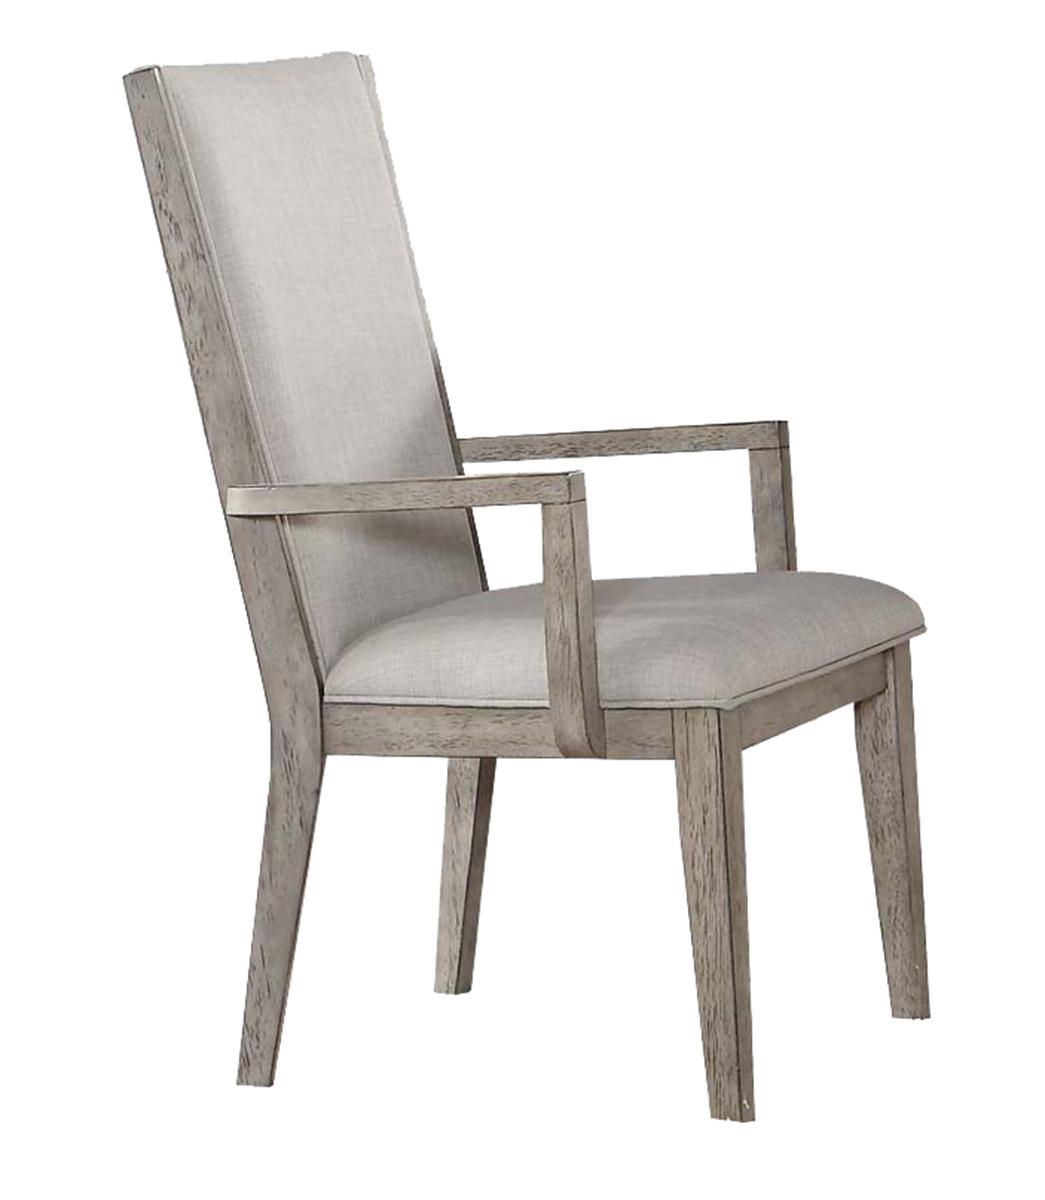 Acme Rocky Arm Chair - Fabric/Gray Oak